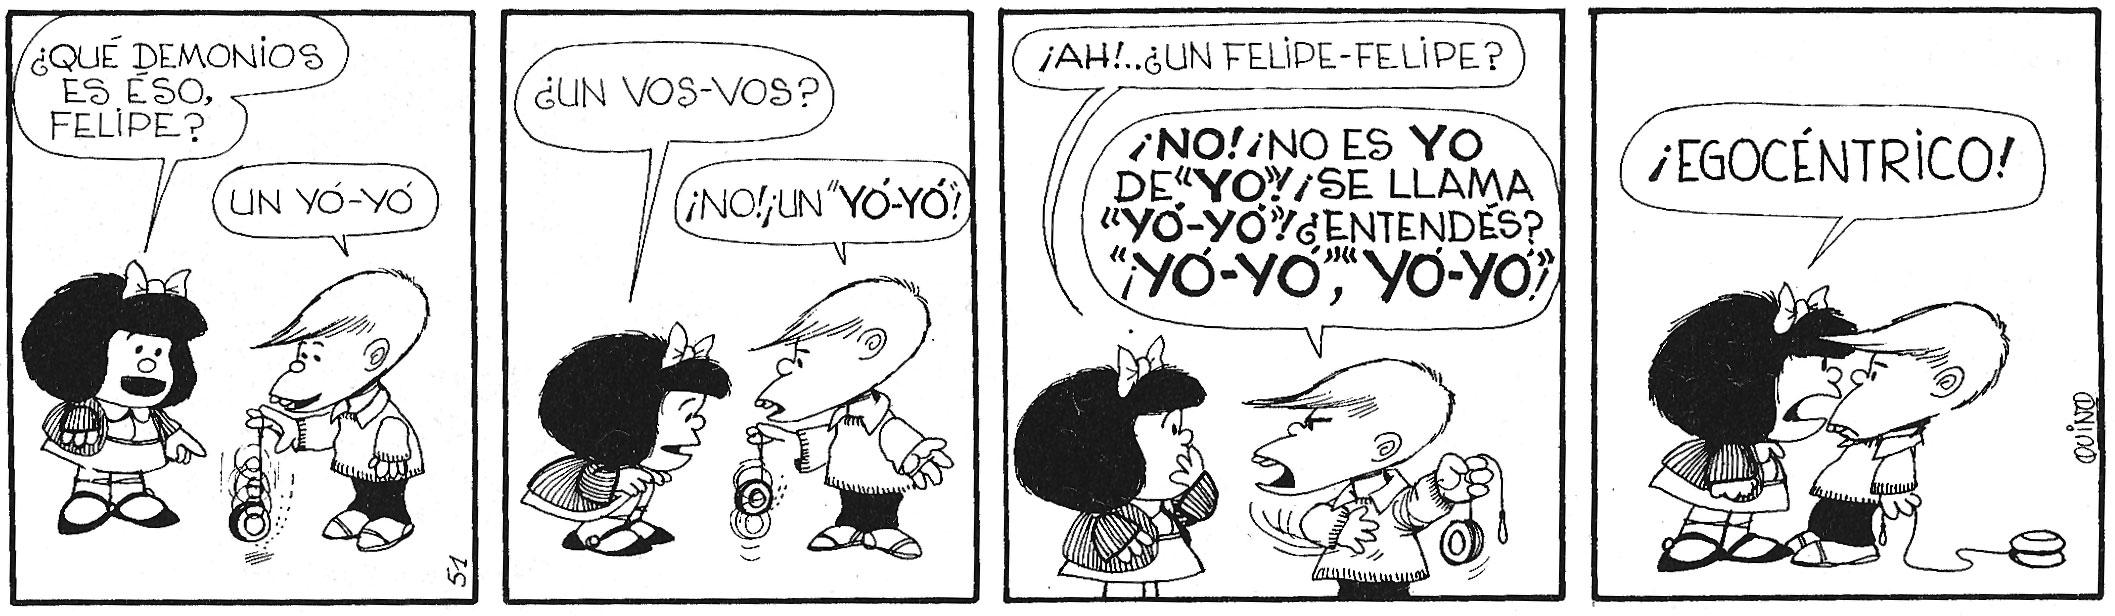 Mafalda Comics